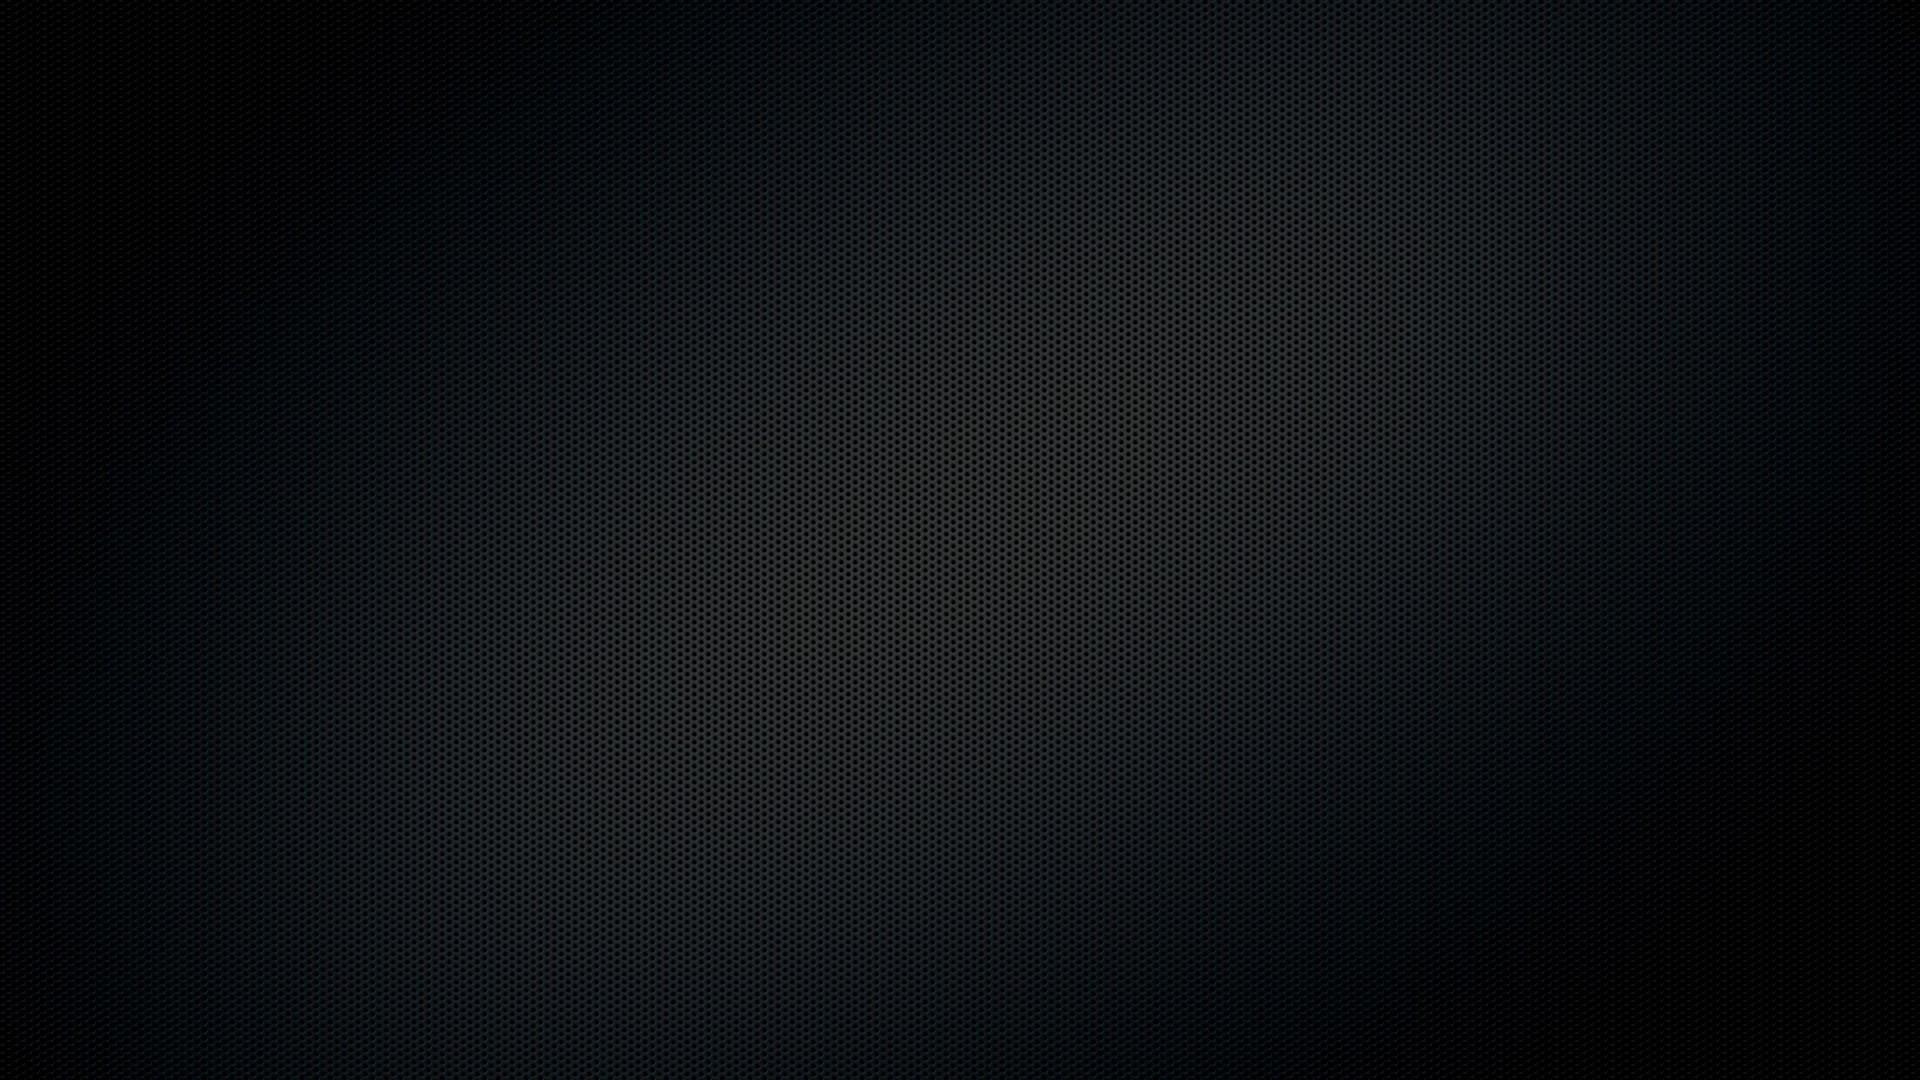 Black Hd Wallpaper 7 Hd Wallpaper